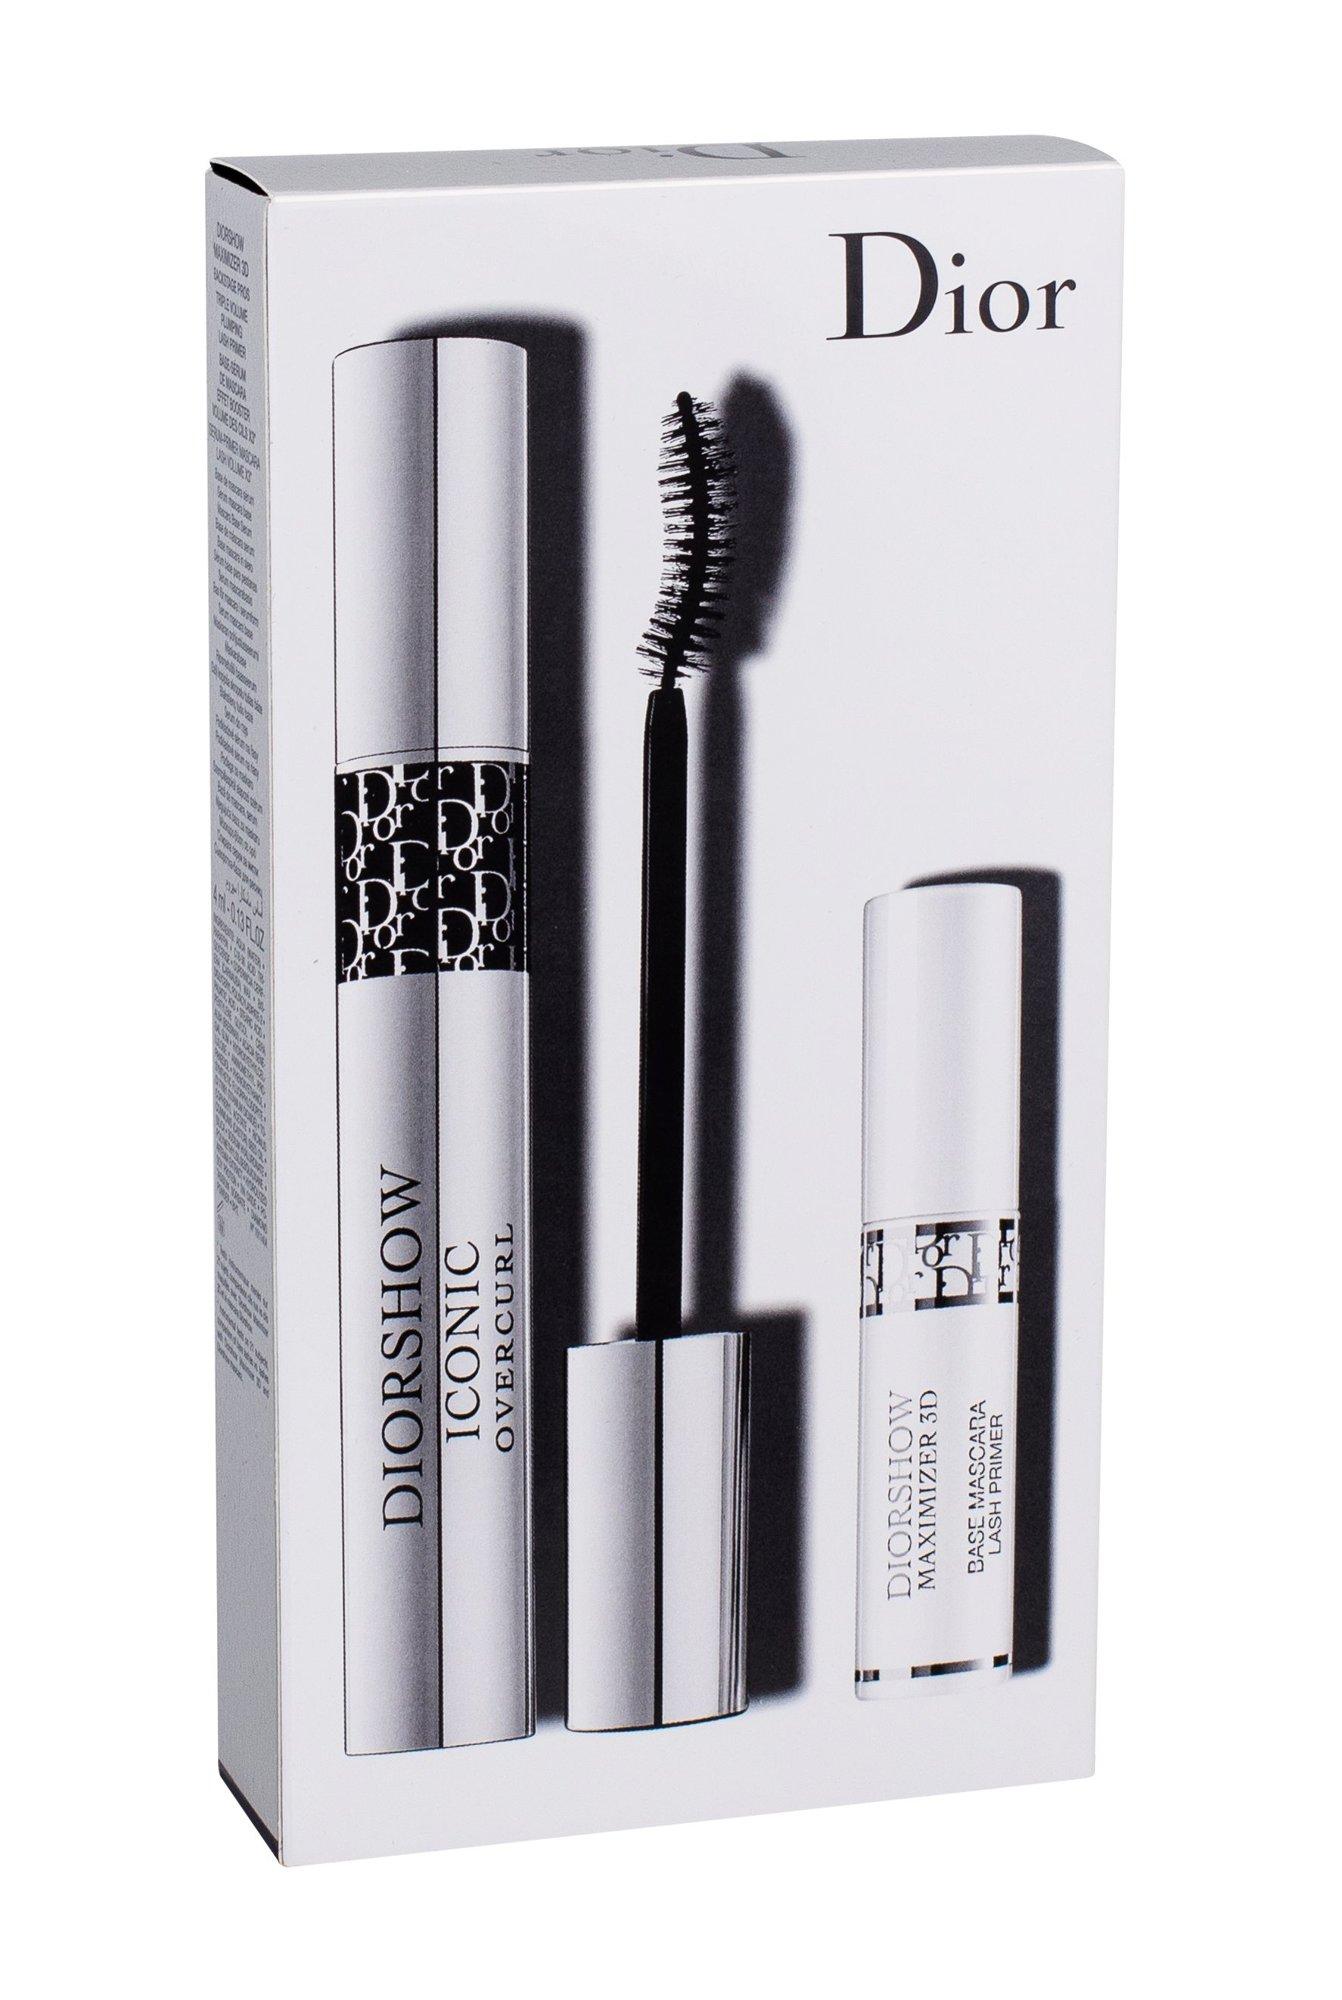 Christian Dior Diorshow Iconic Overcurl Mascara 10ml 090 Over Black